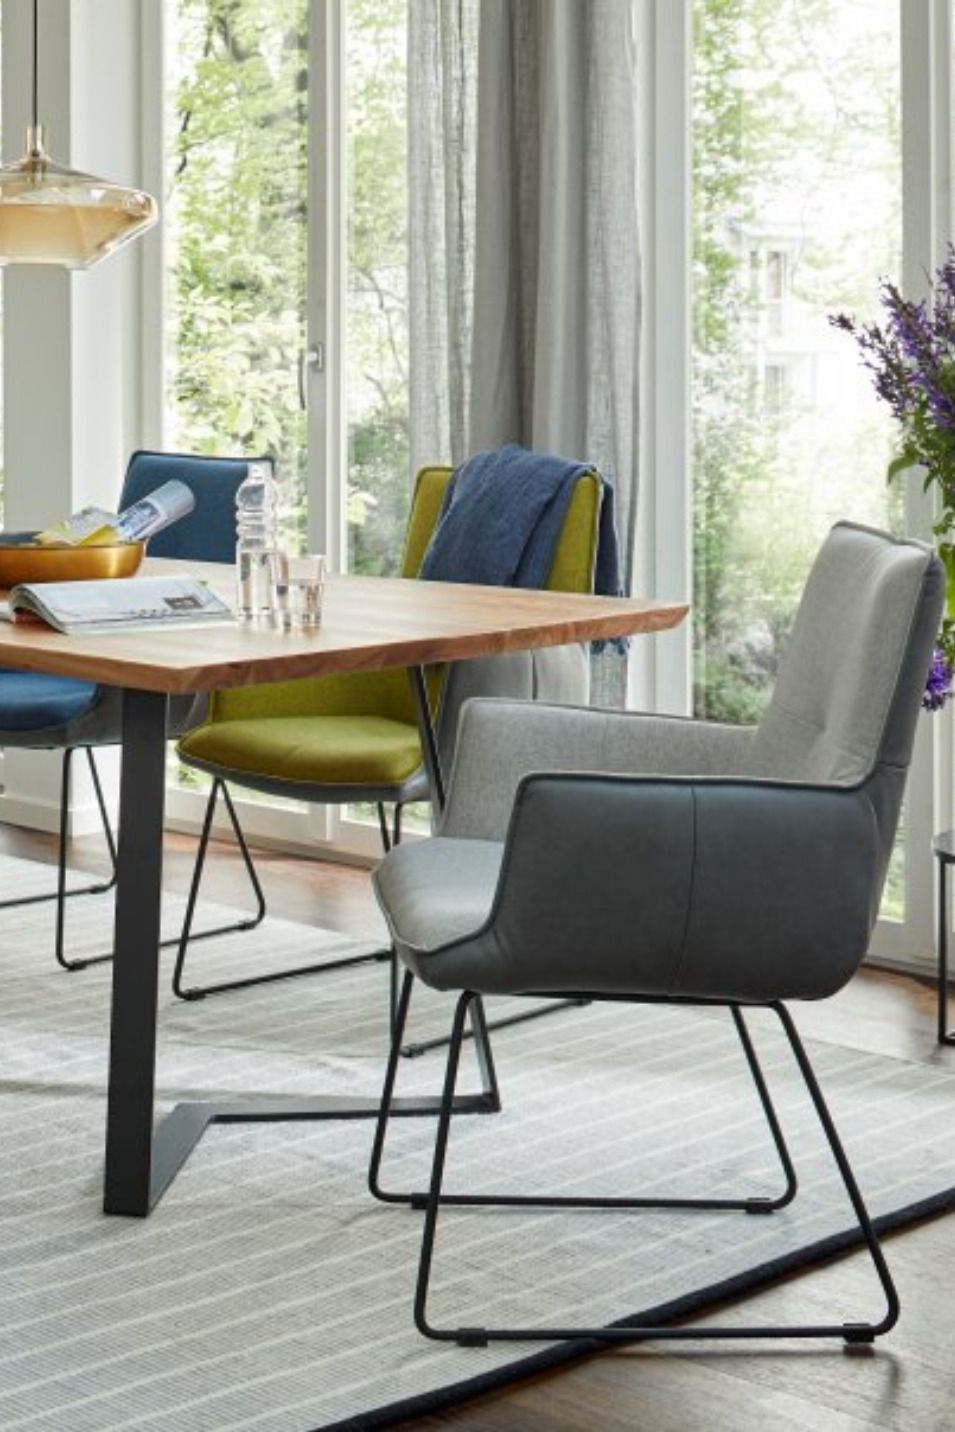 Esszimmer Sessel In Bi Color Optik Esszimmer Sessel Esszimmerstuhl Esszimmer